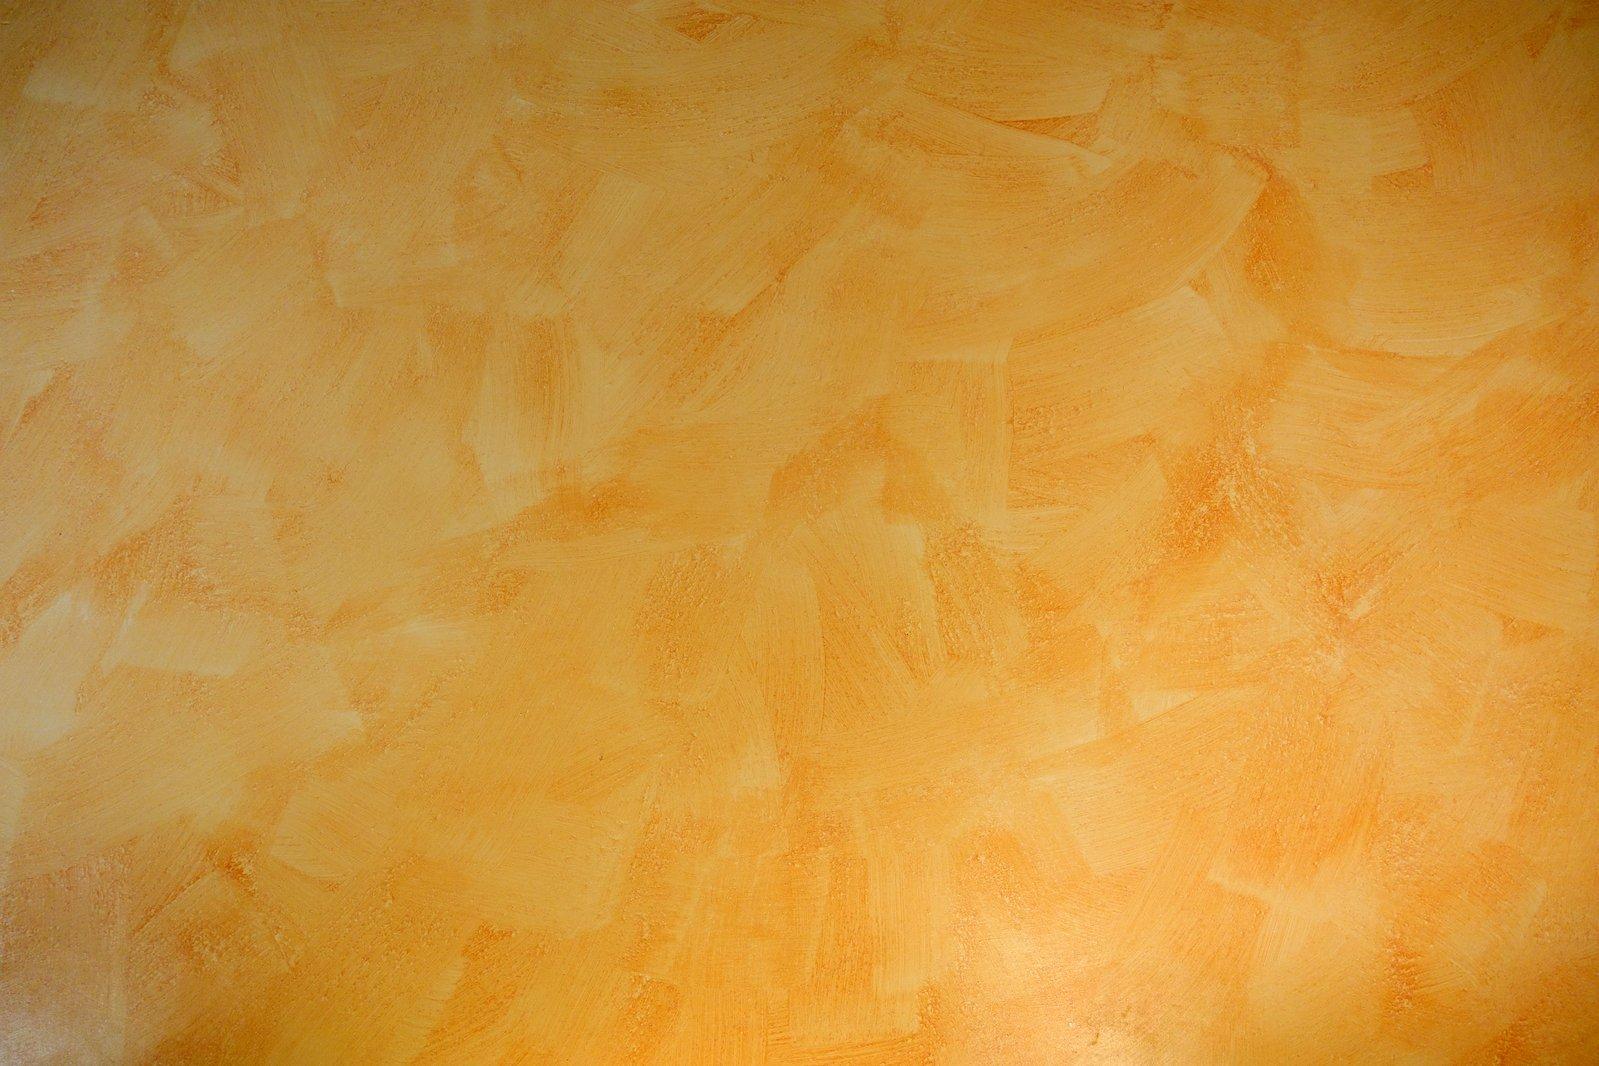 Free orange paint texture Stock Photo - FreeImages.com